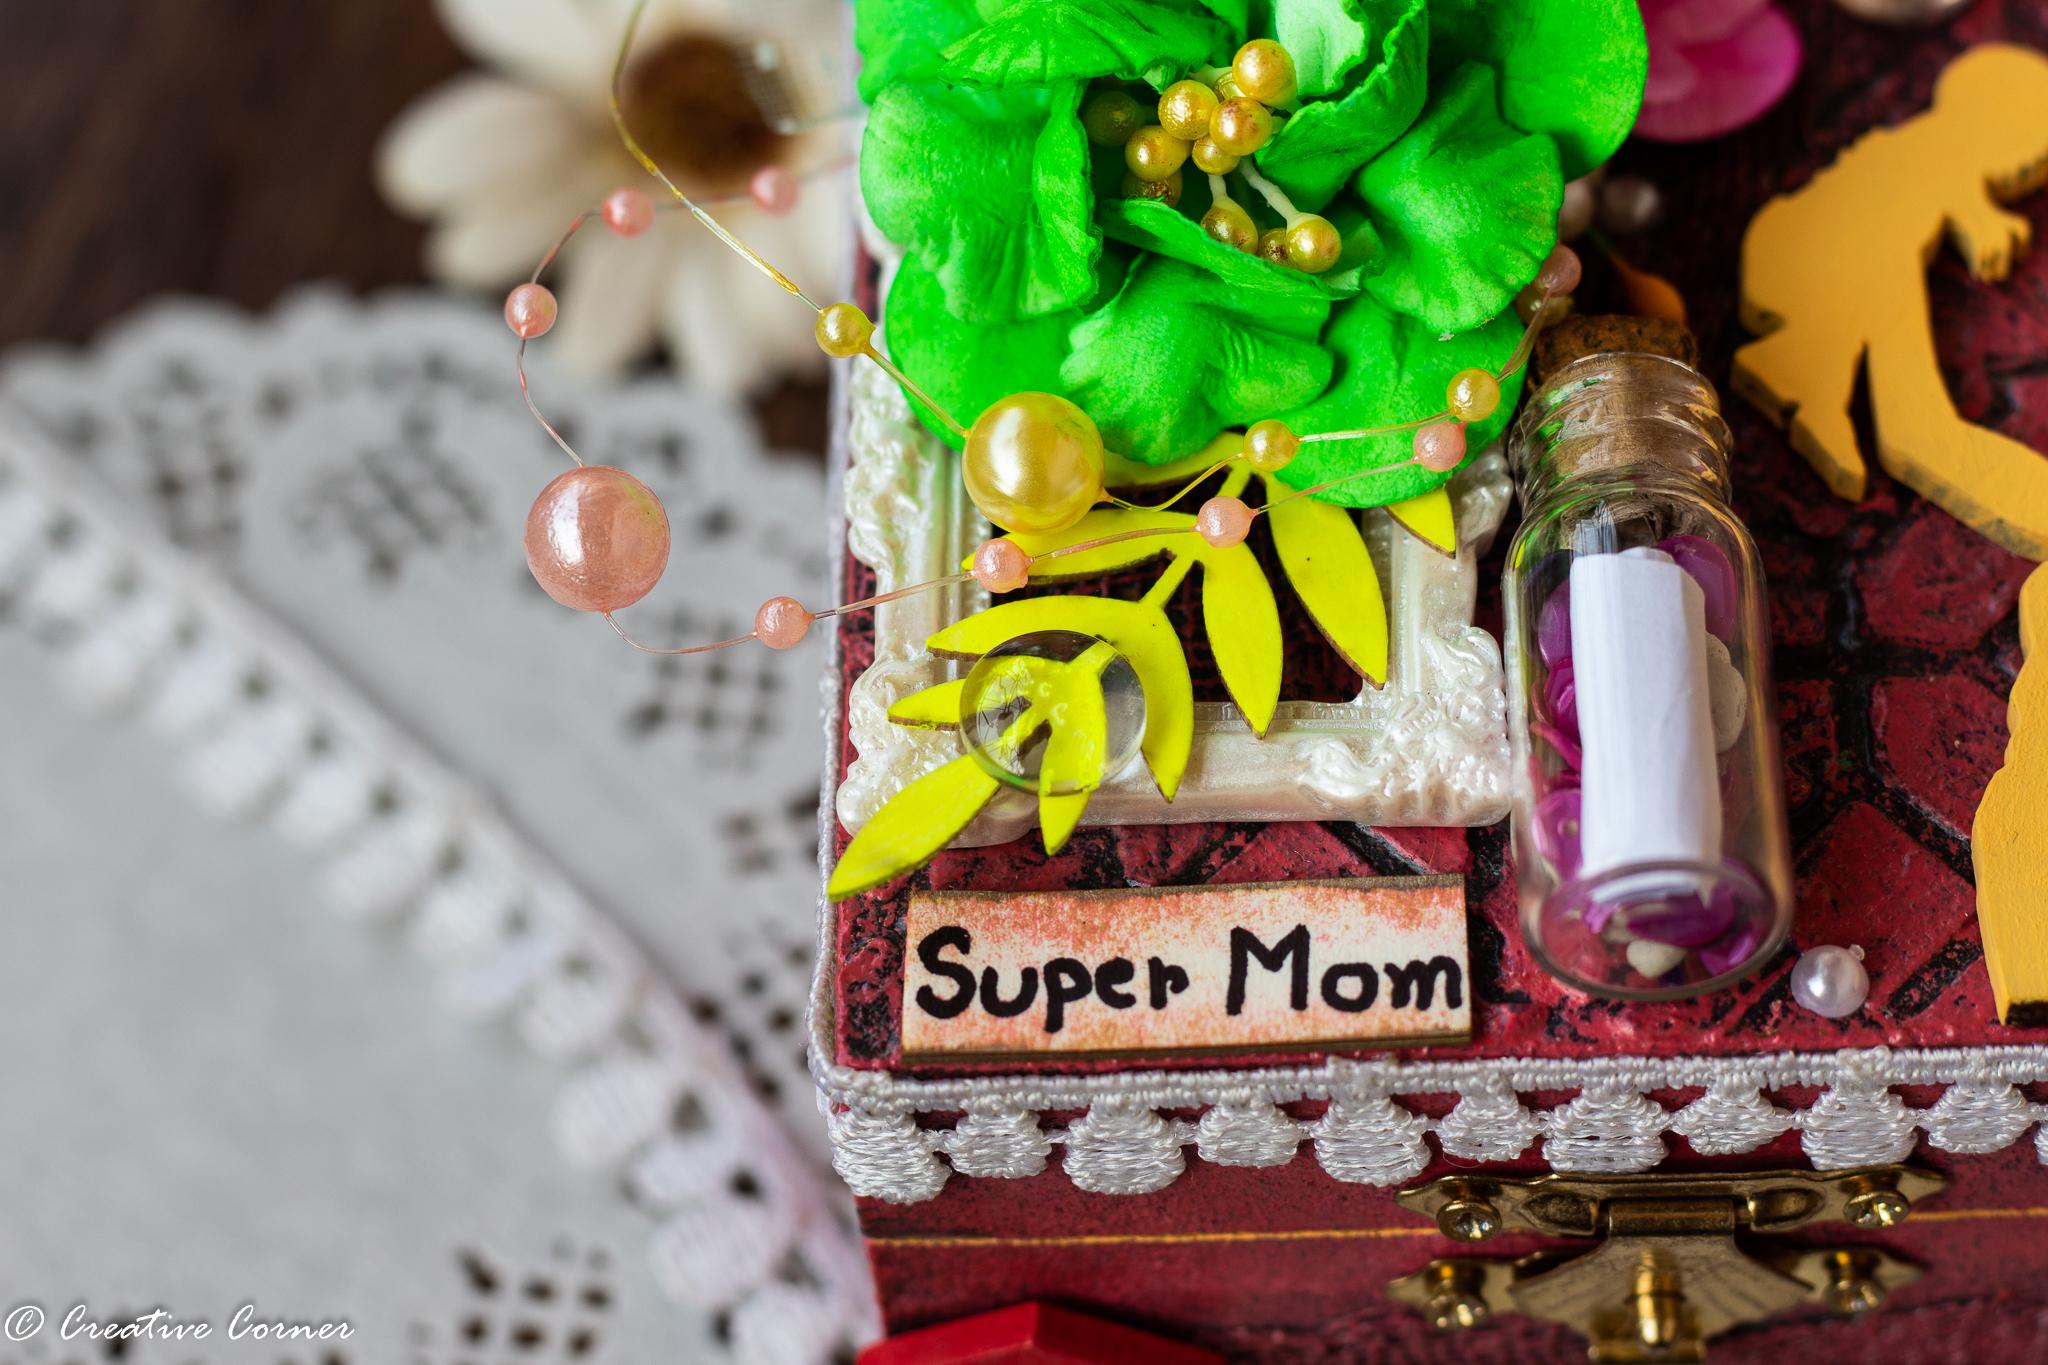 Mom Special Box